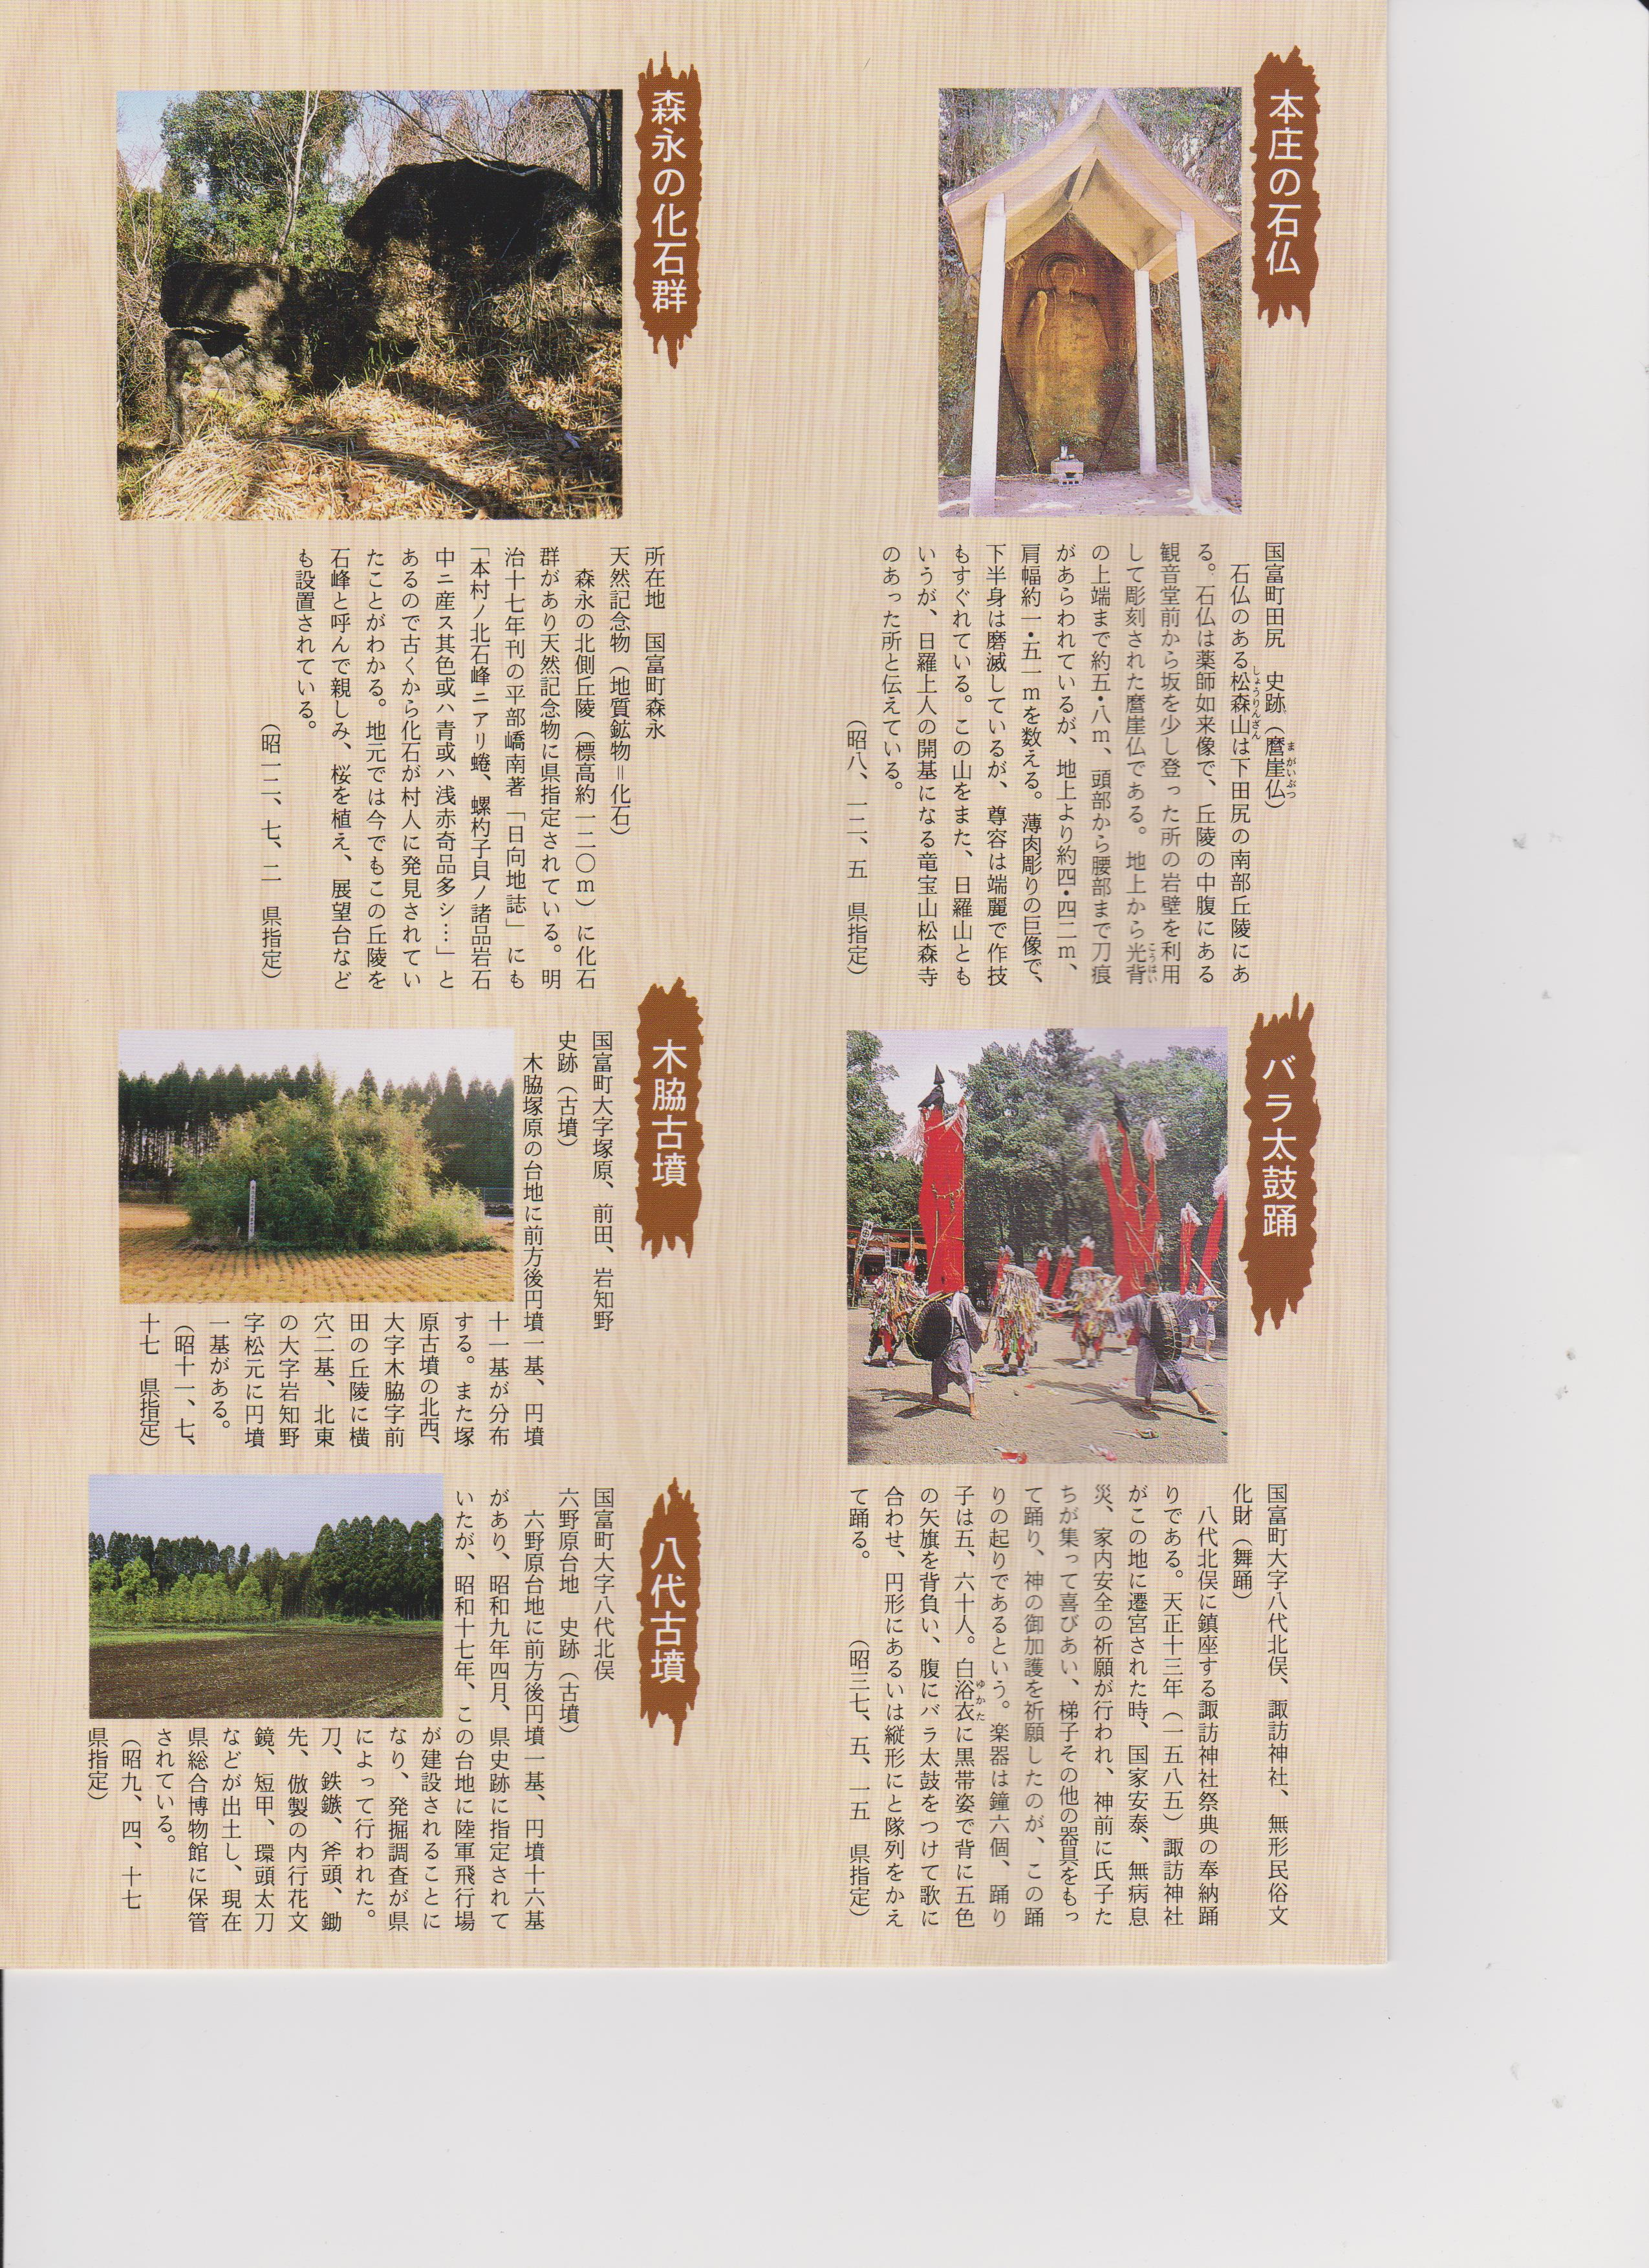 国富町本庄地区文化財案内板 - kunitomigakuouen ページ!